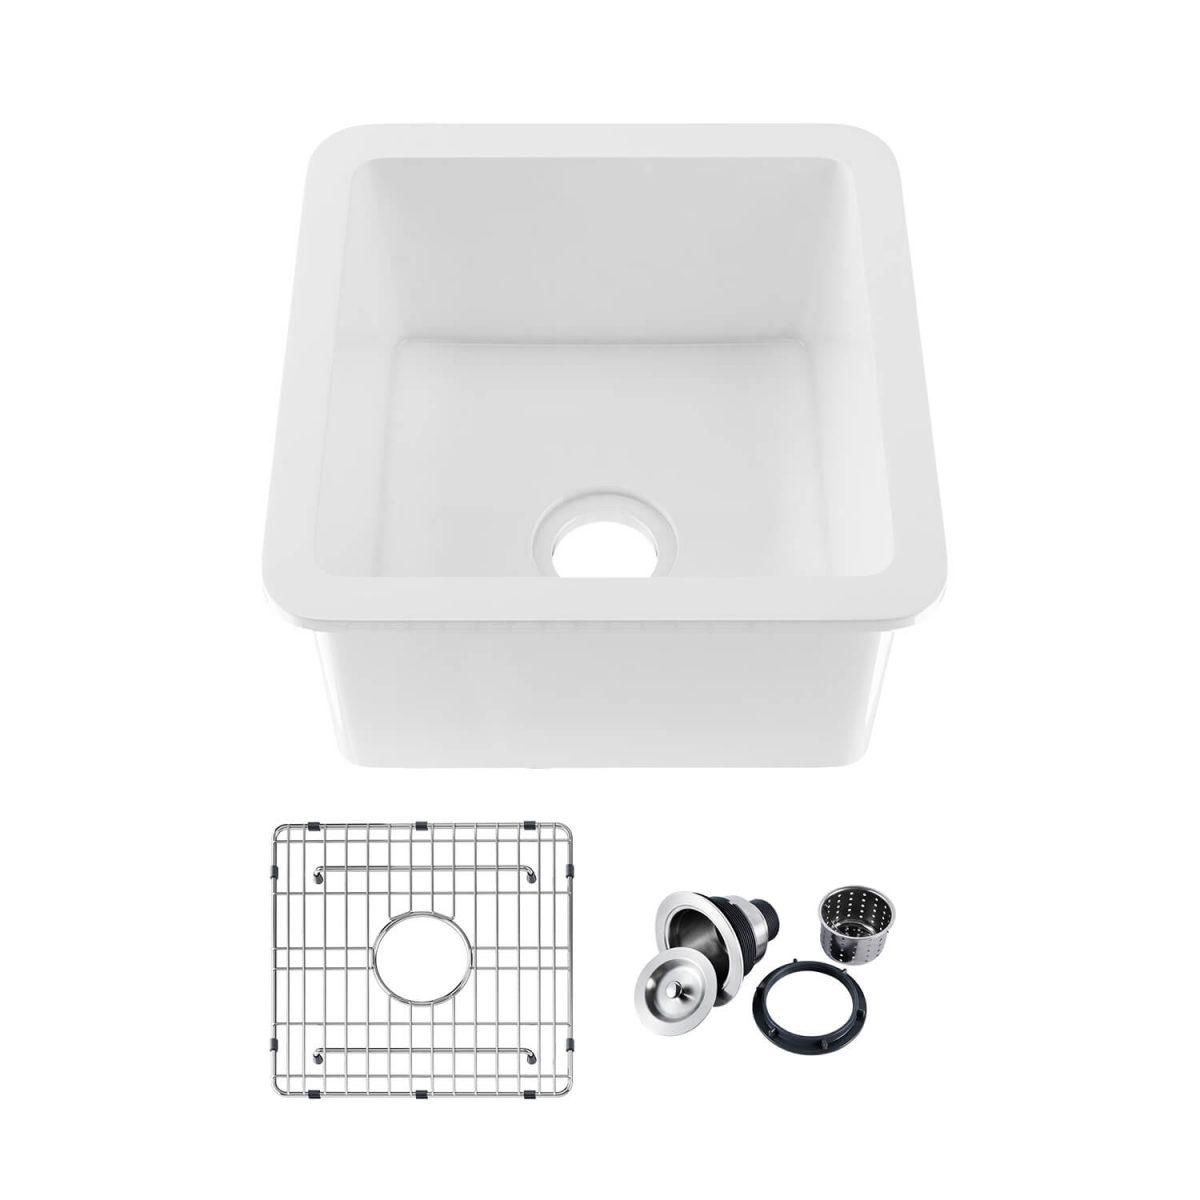 "18"" Fireclay Undermounted Kitchen Sink Cubic Series - K2-S18SQ"